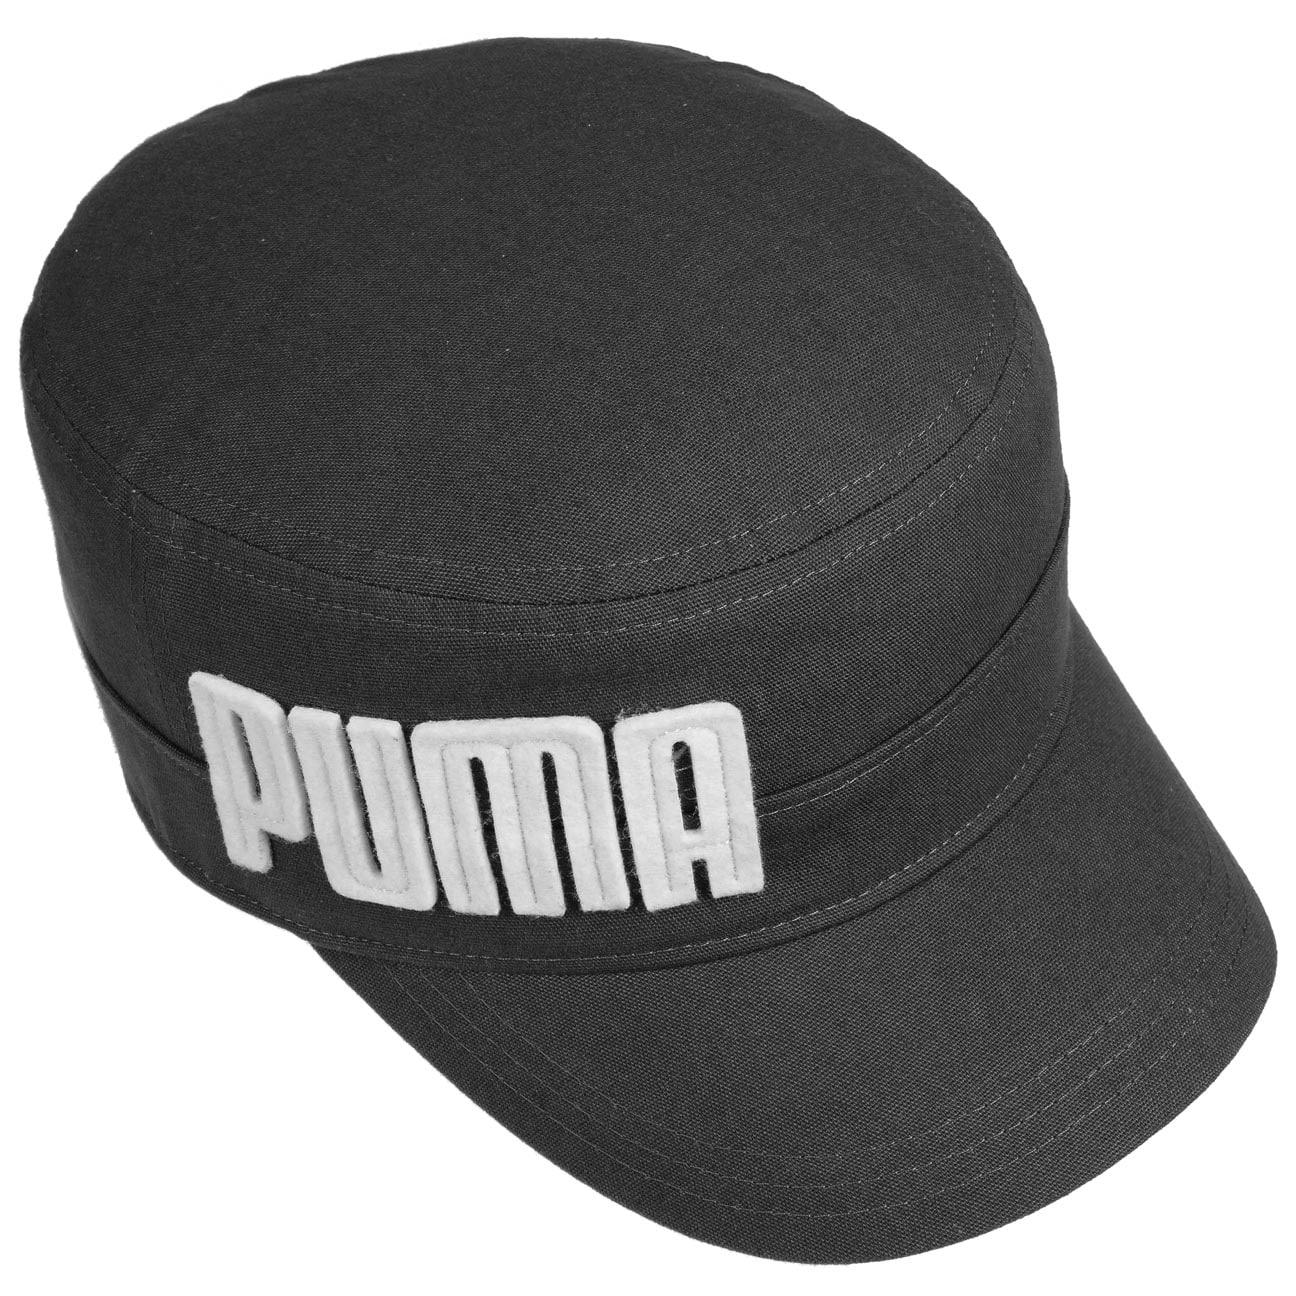 ... Casquette Penham Military Army by PUMA - noir 2 ...